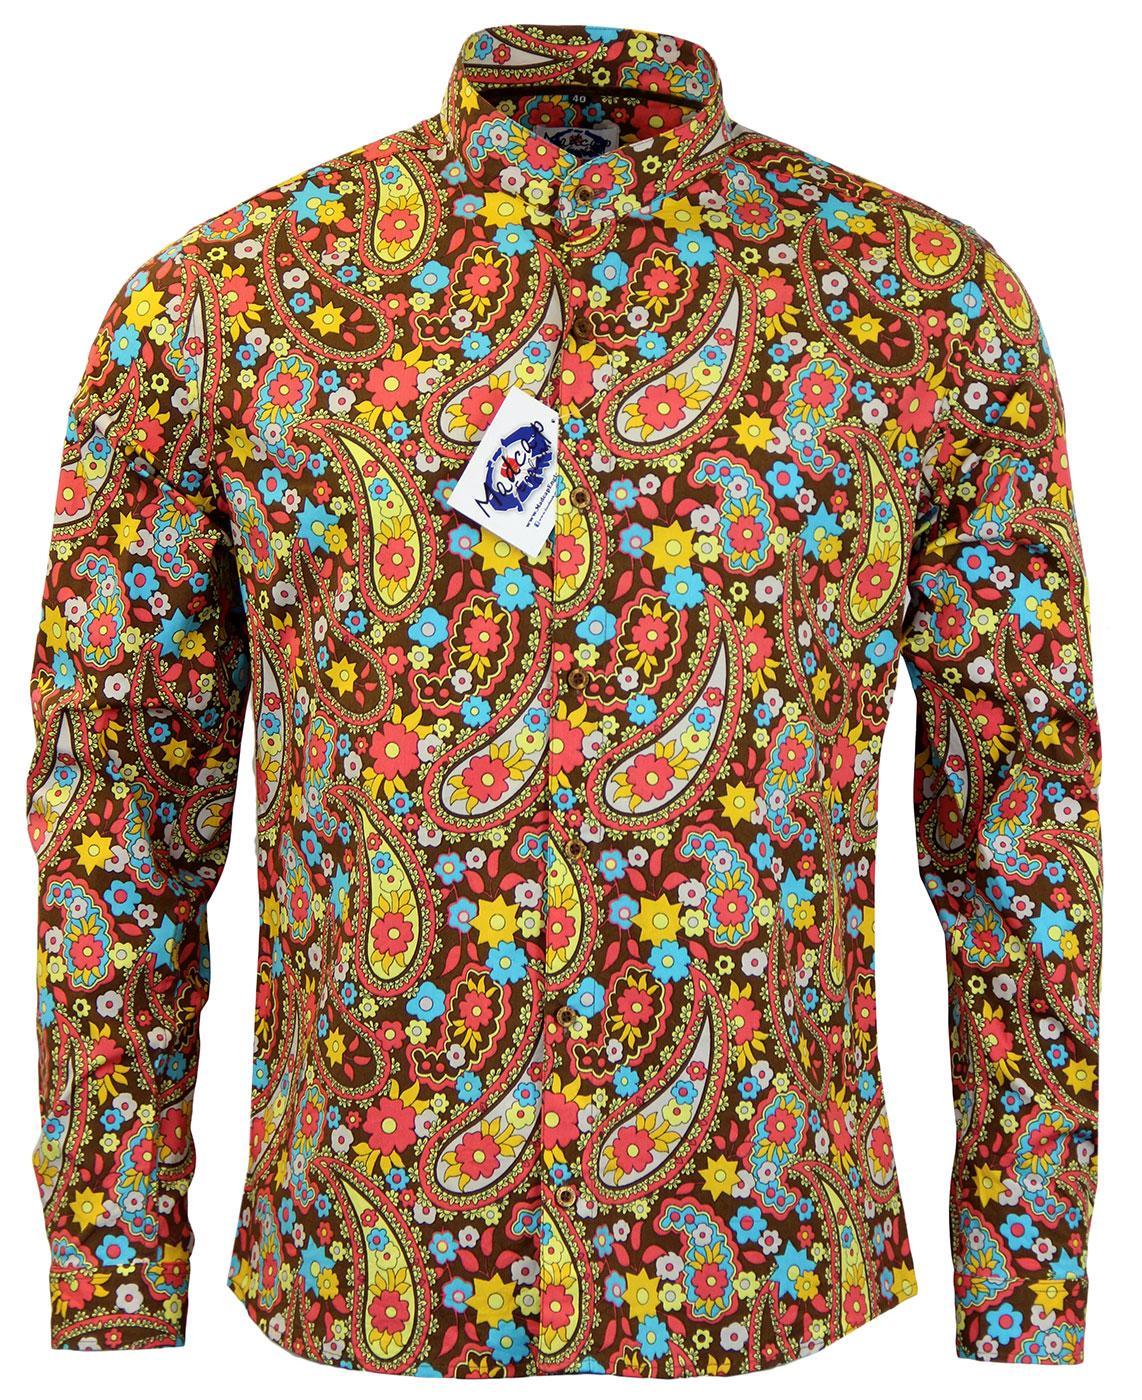 Madcap England Indra Paisley 60s Mod Grandad Collar Floral Shirt